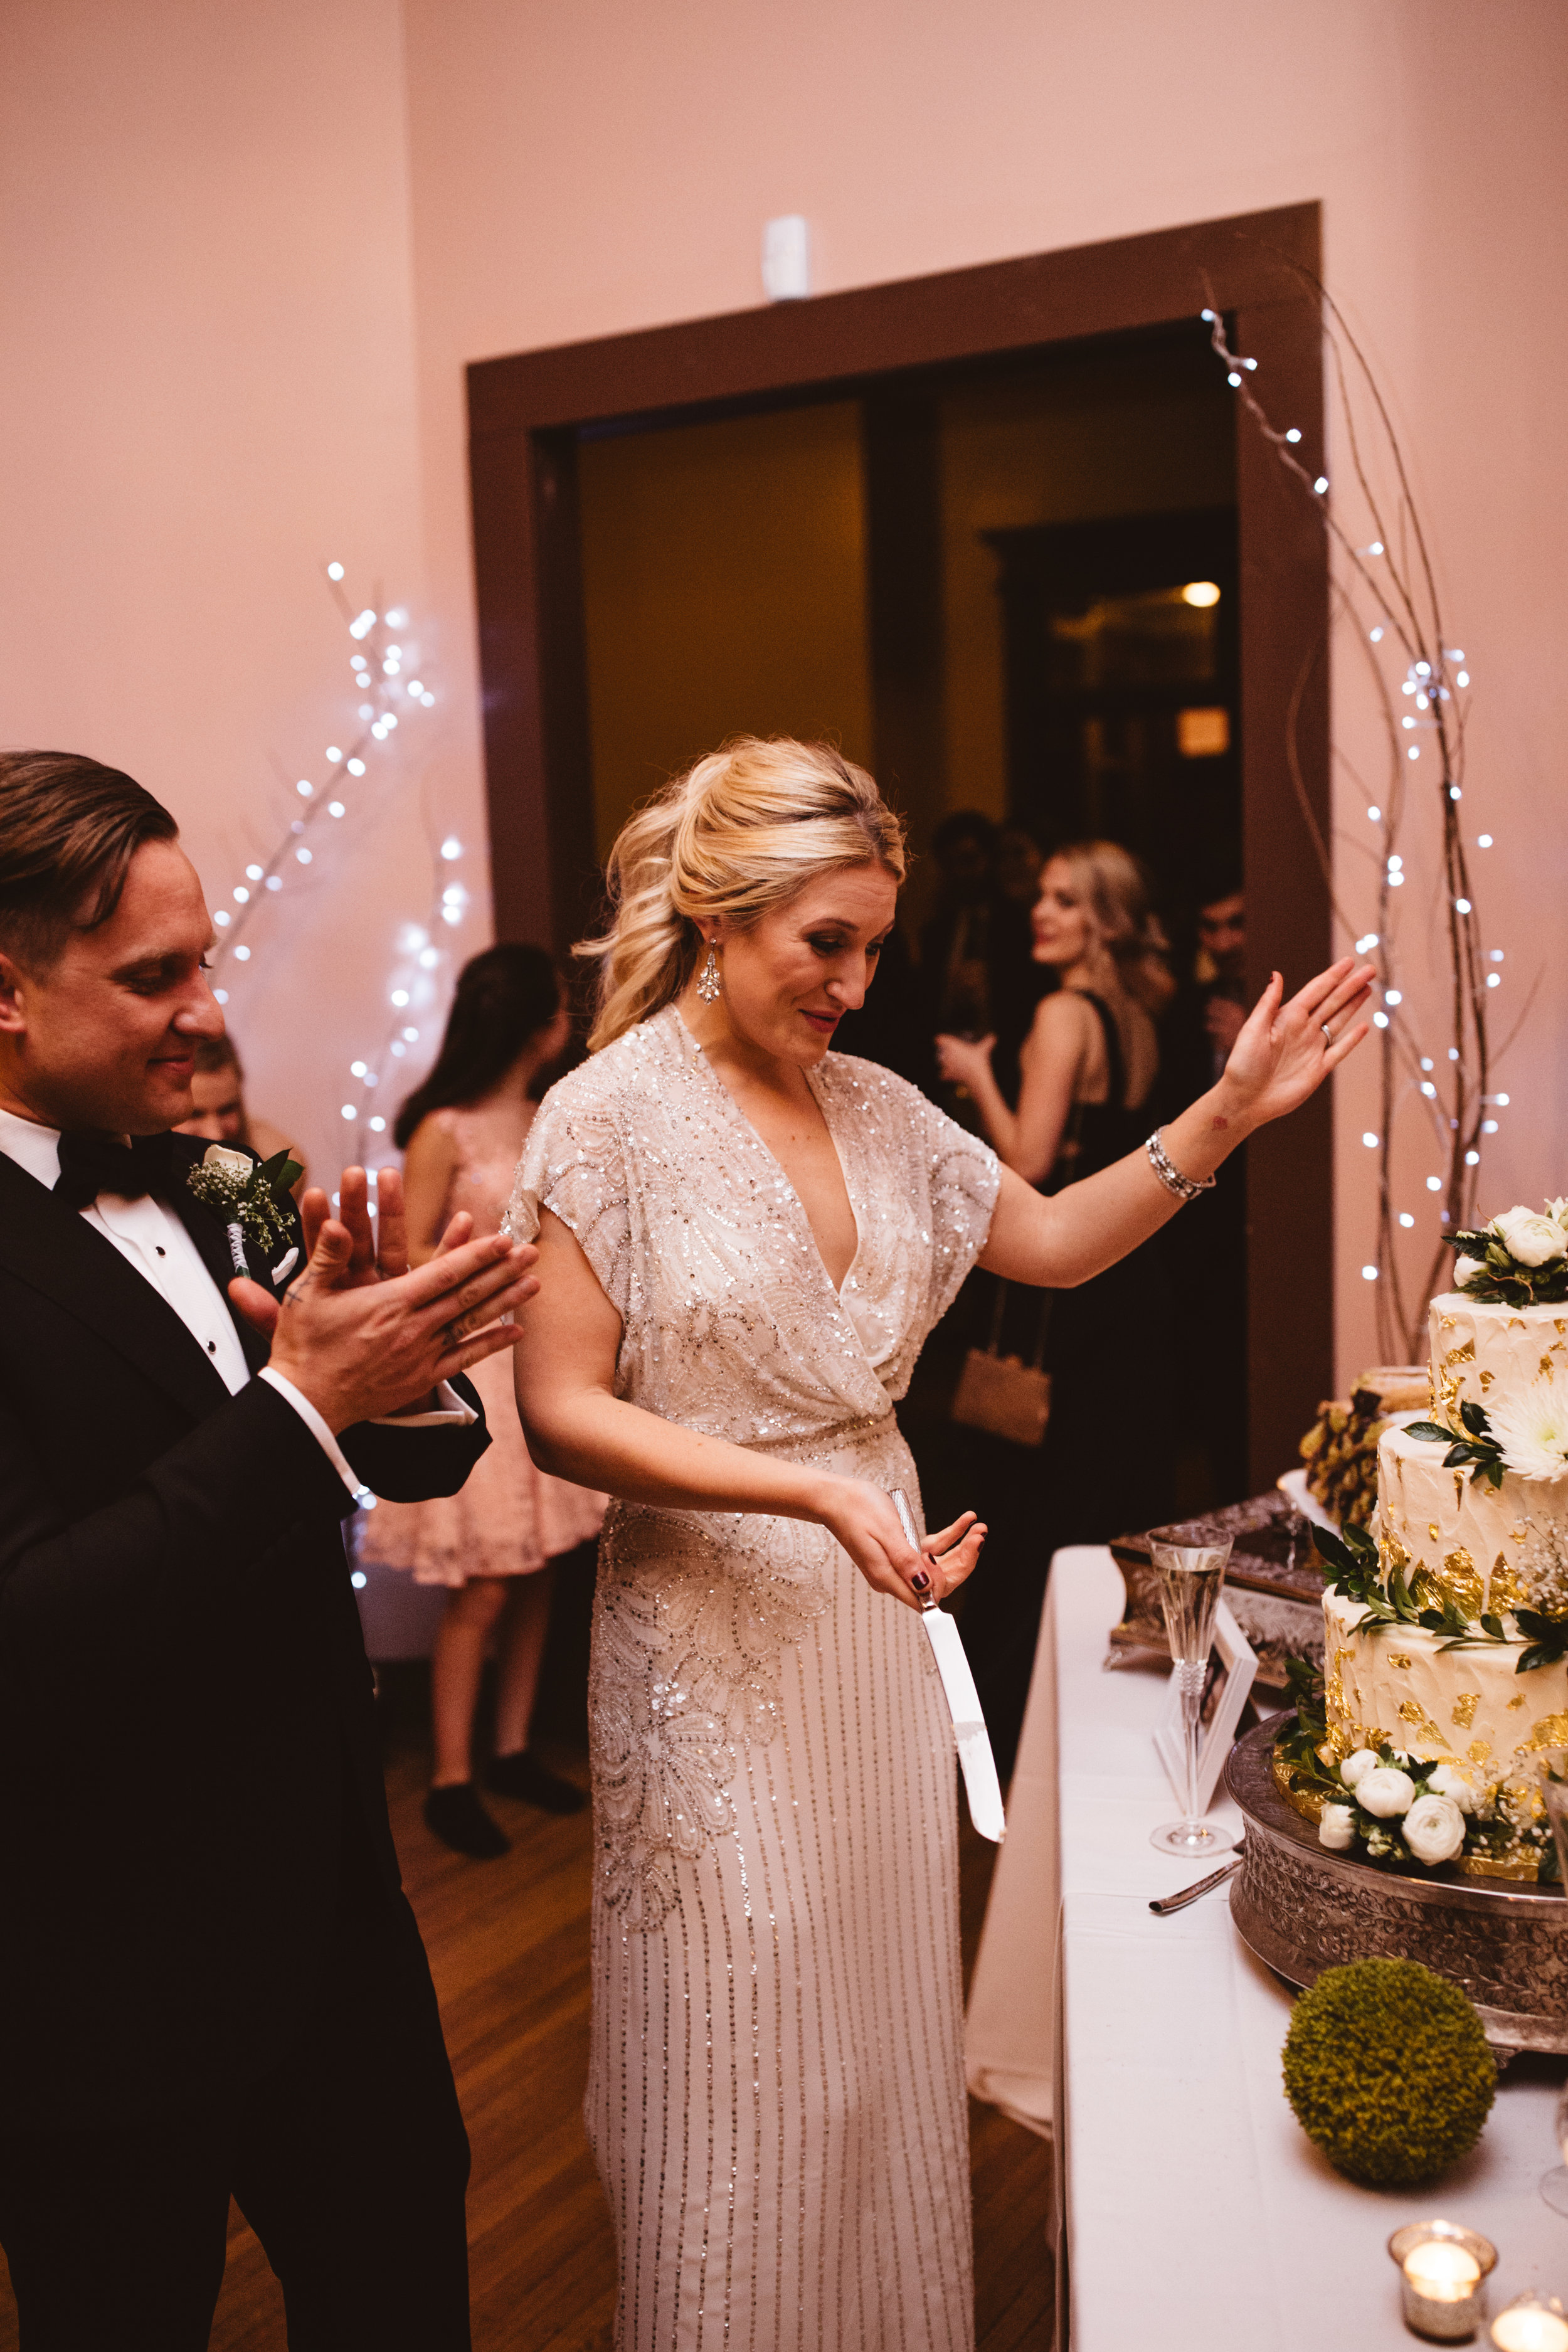 Mattie Bell Photography- Kelly & Zack Wedding Atlanta Brewery -399.jpg